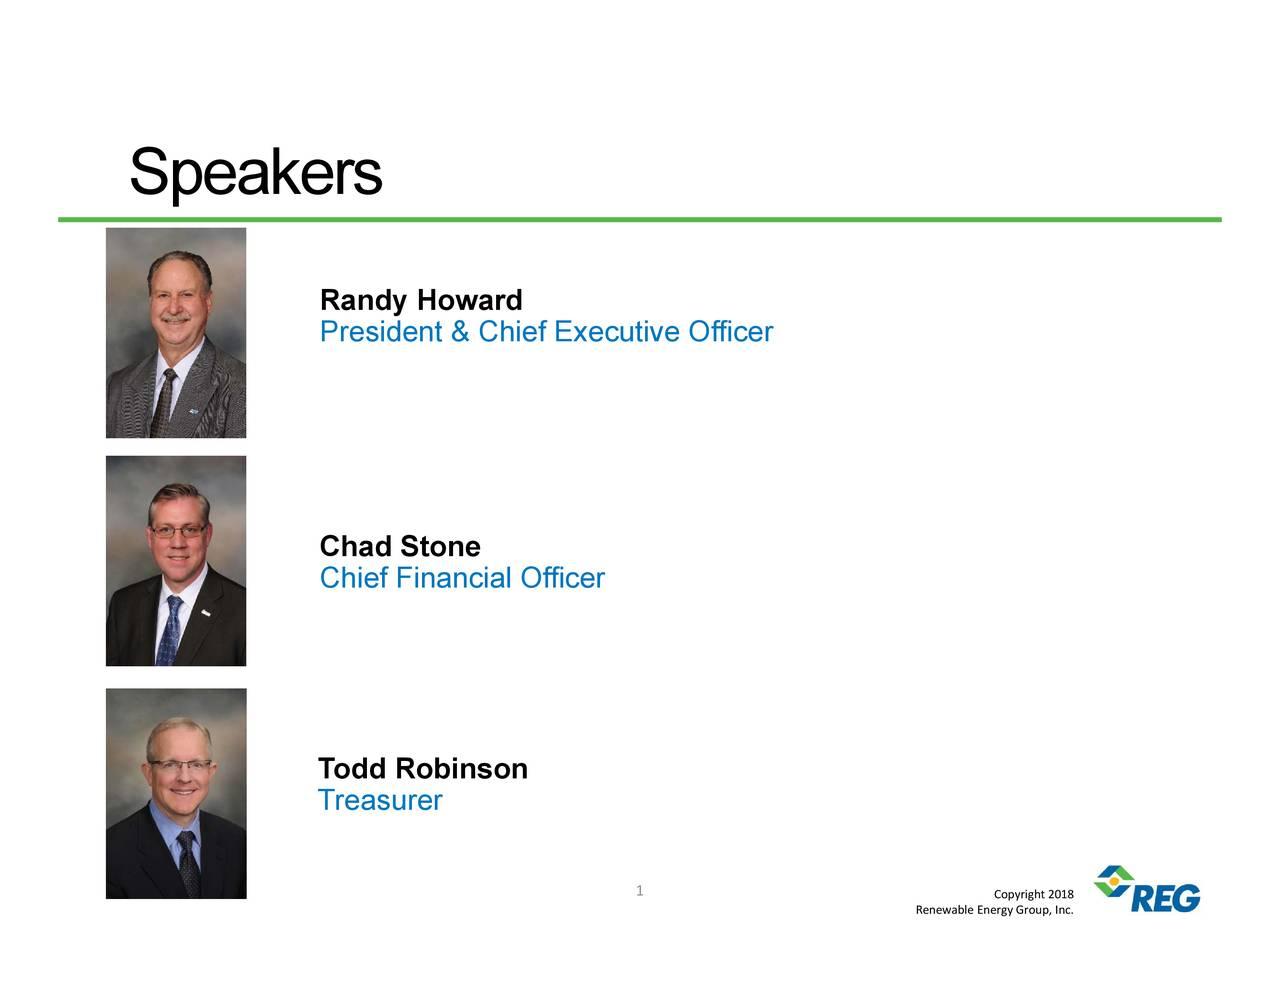 Renewable Energy Group, Inc. 1 RaPnesidowt&rChiefhCadSfivnOnffaTodreRsubirson Speakers